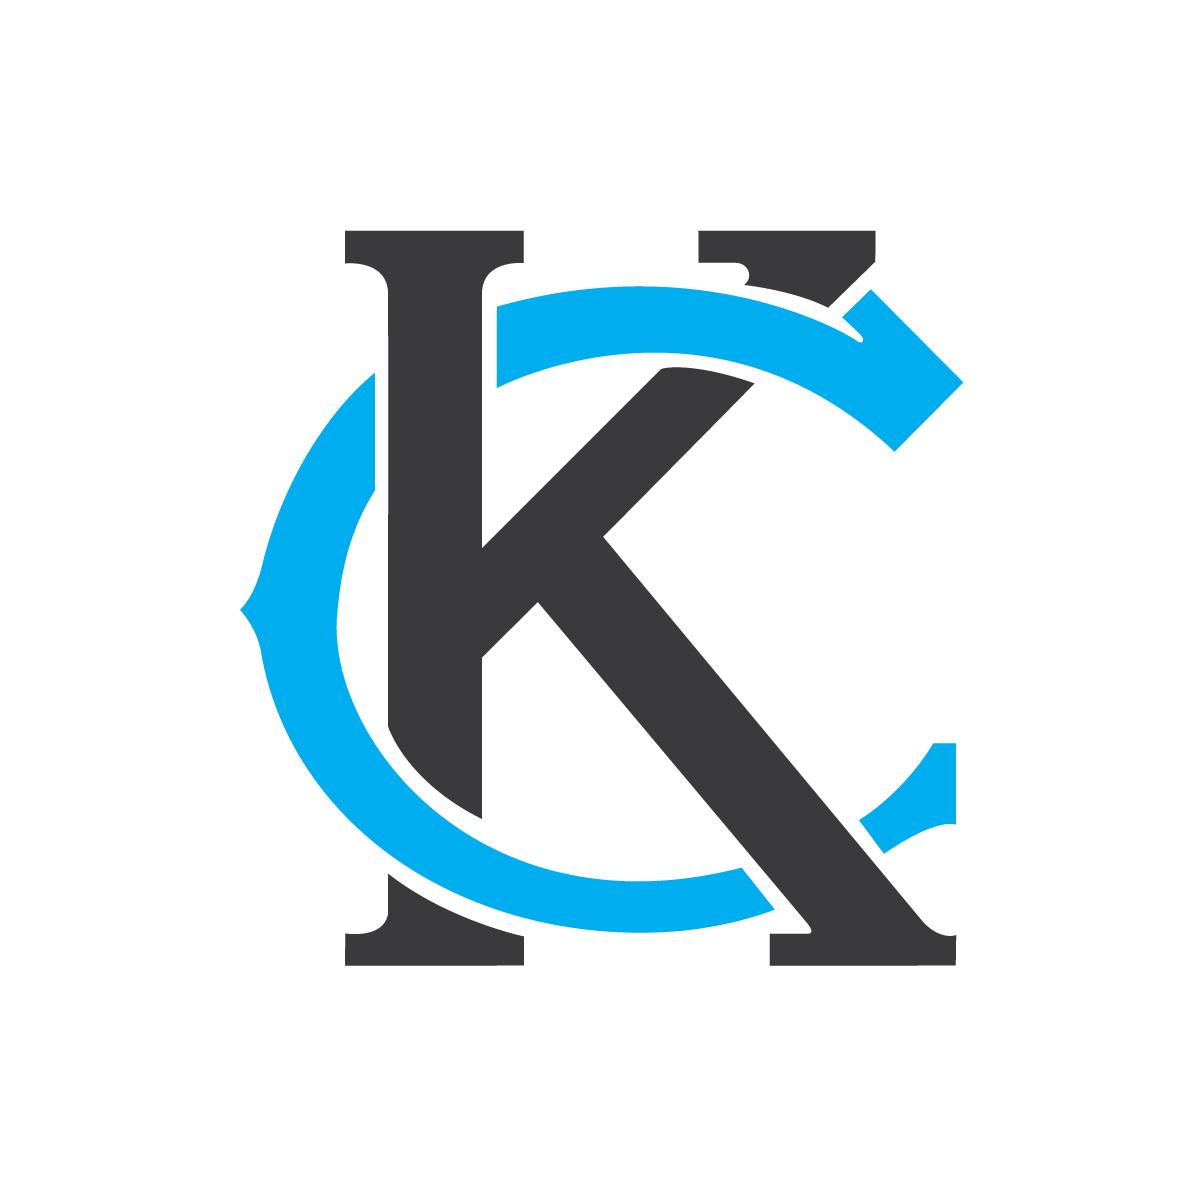 kclogo.png